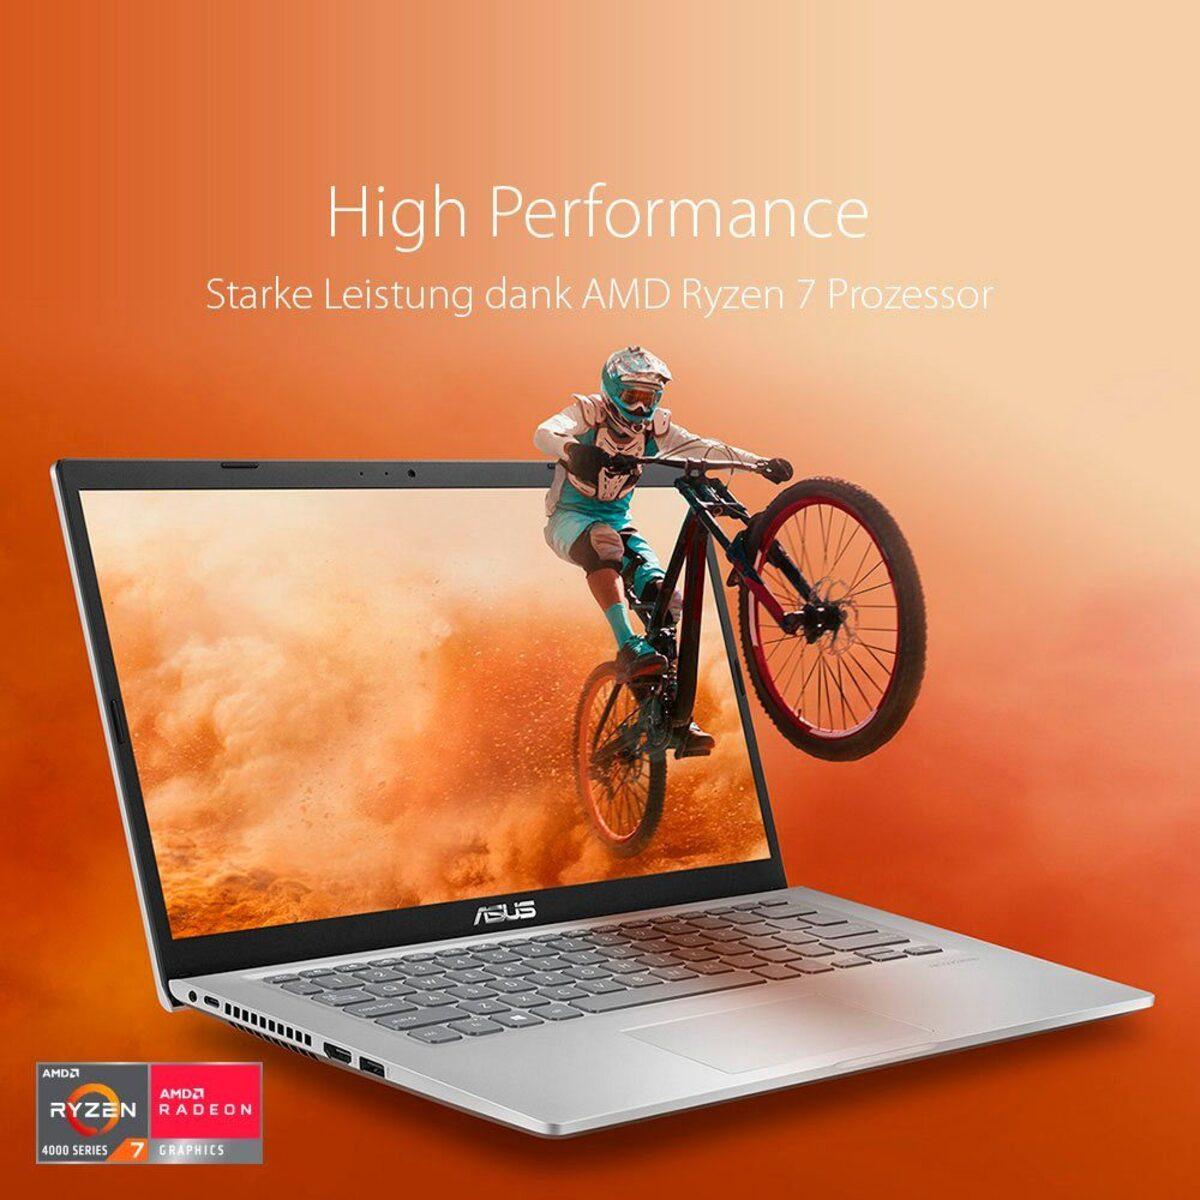 Bild 3 von Asus VivoBook F415JP-EB103T Notebook (35,56 cm/14 Zoll, Intel Core i5, 512 GB SSD)